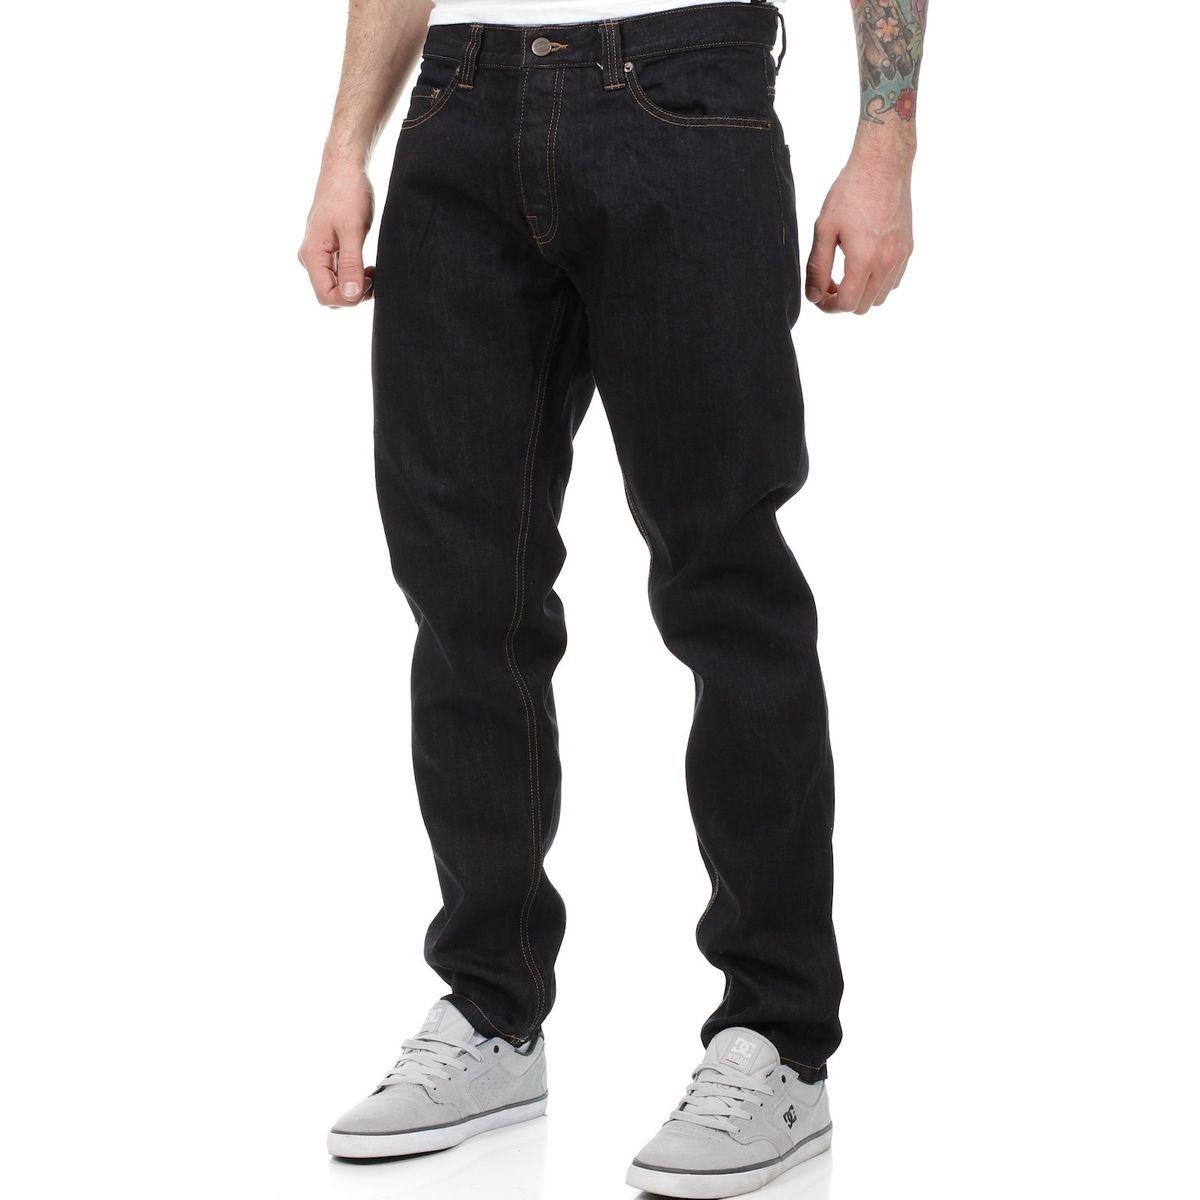 Jeans North Carolina - Regular Fit